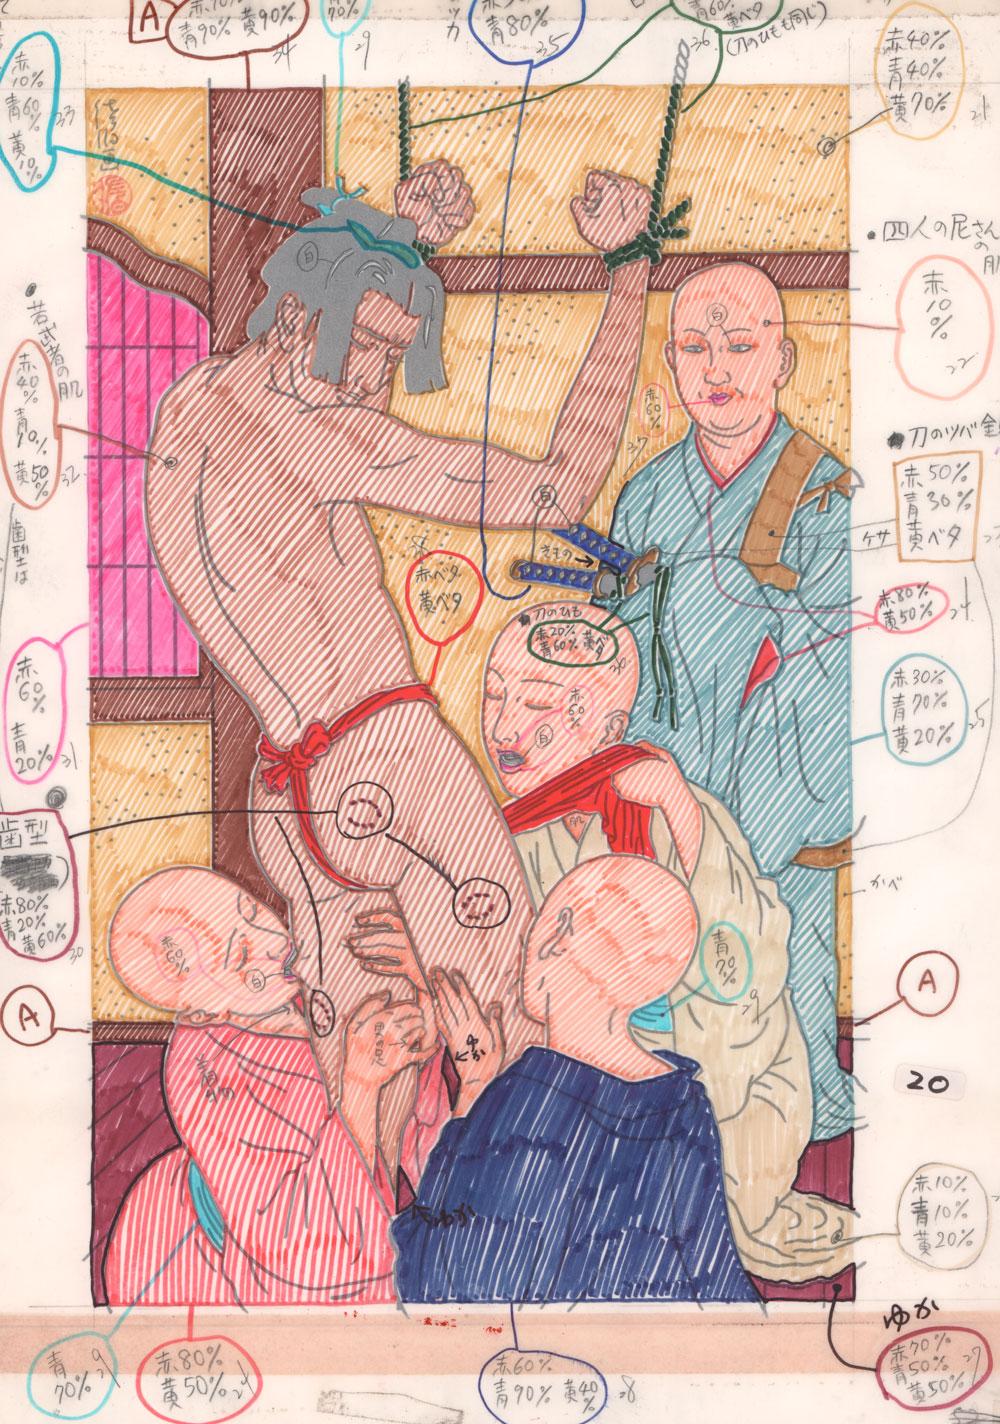 Toshio SaekiHanshokuni, 1983Ink on vellum.12 x 17 in. unframed